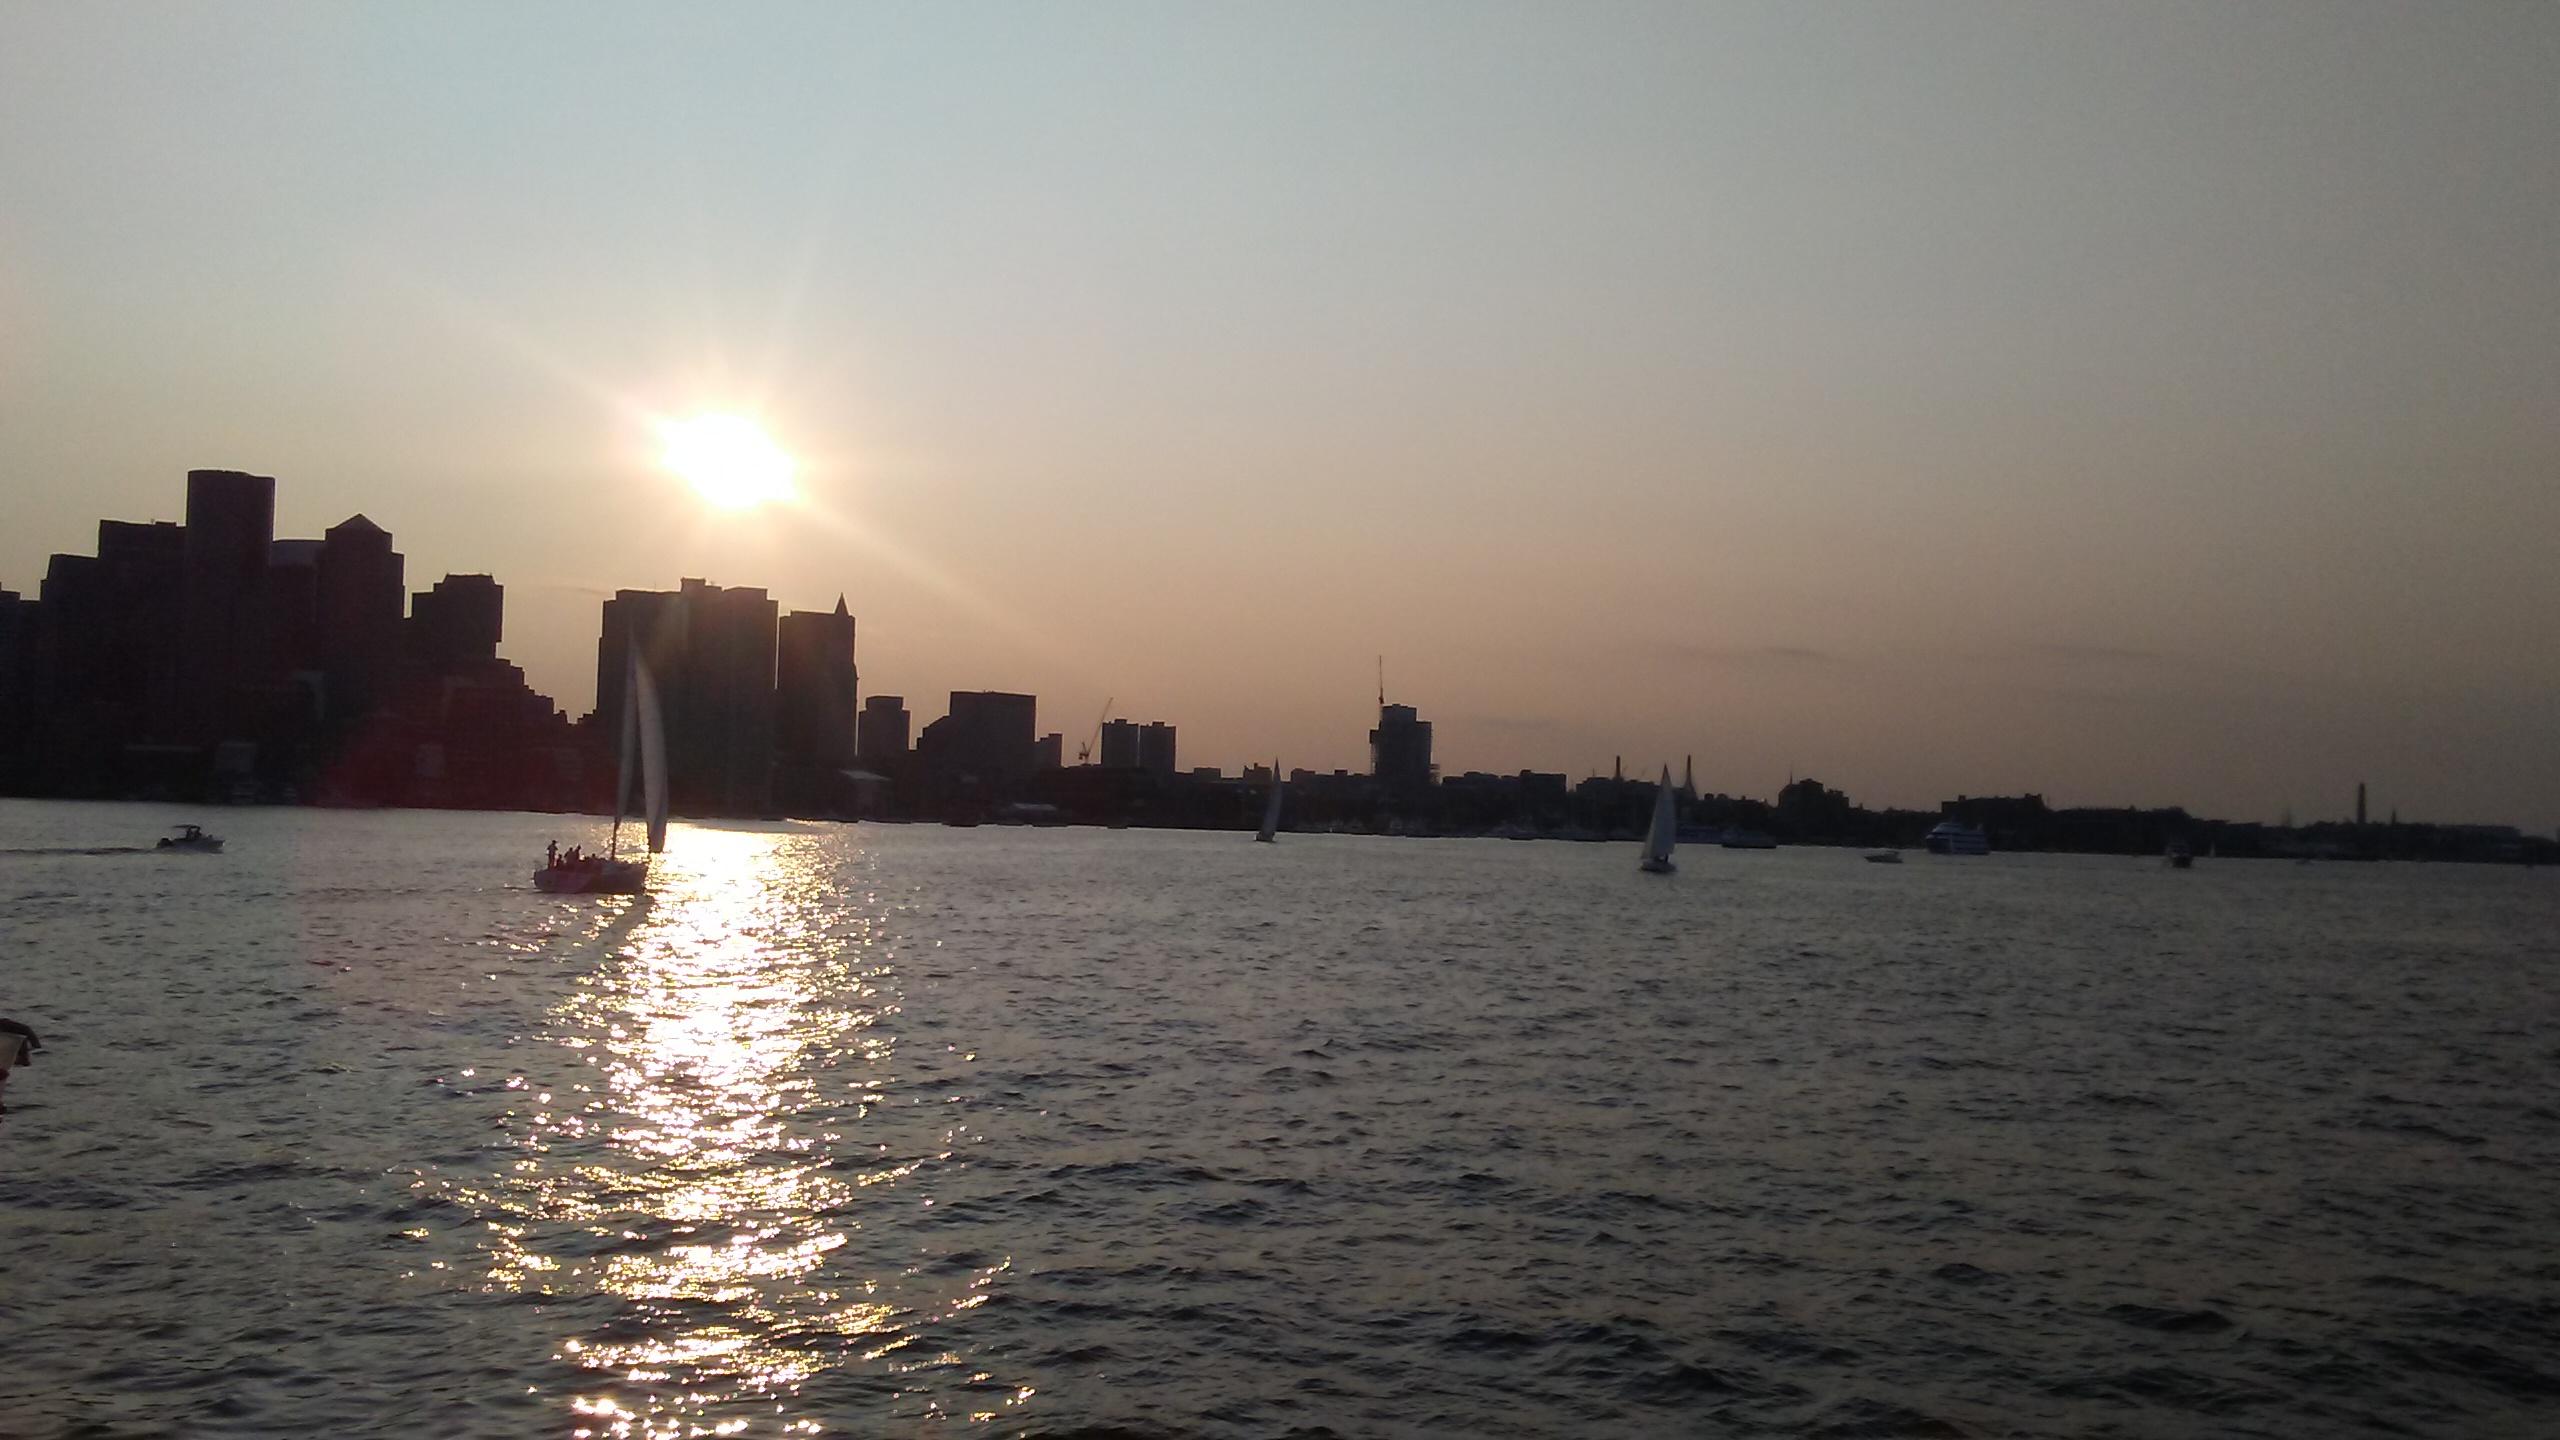 Boston skyline view